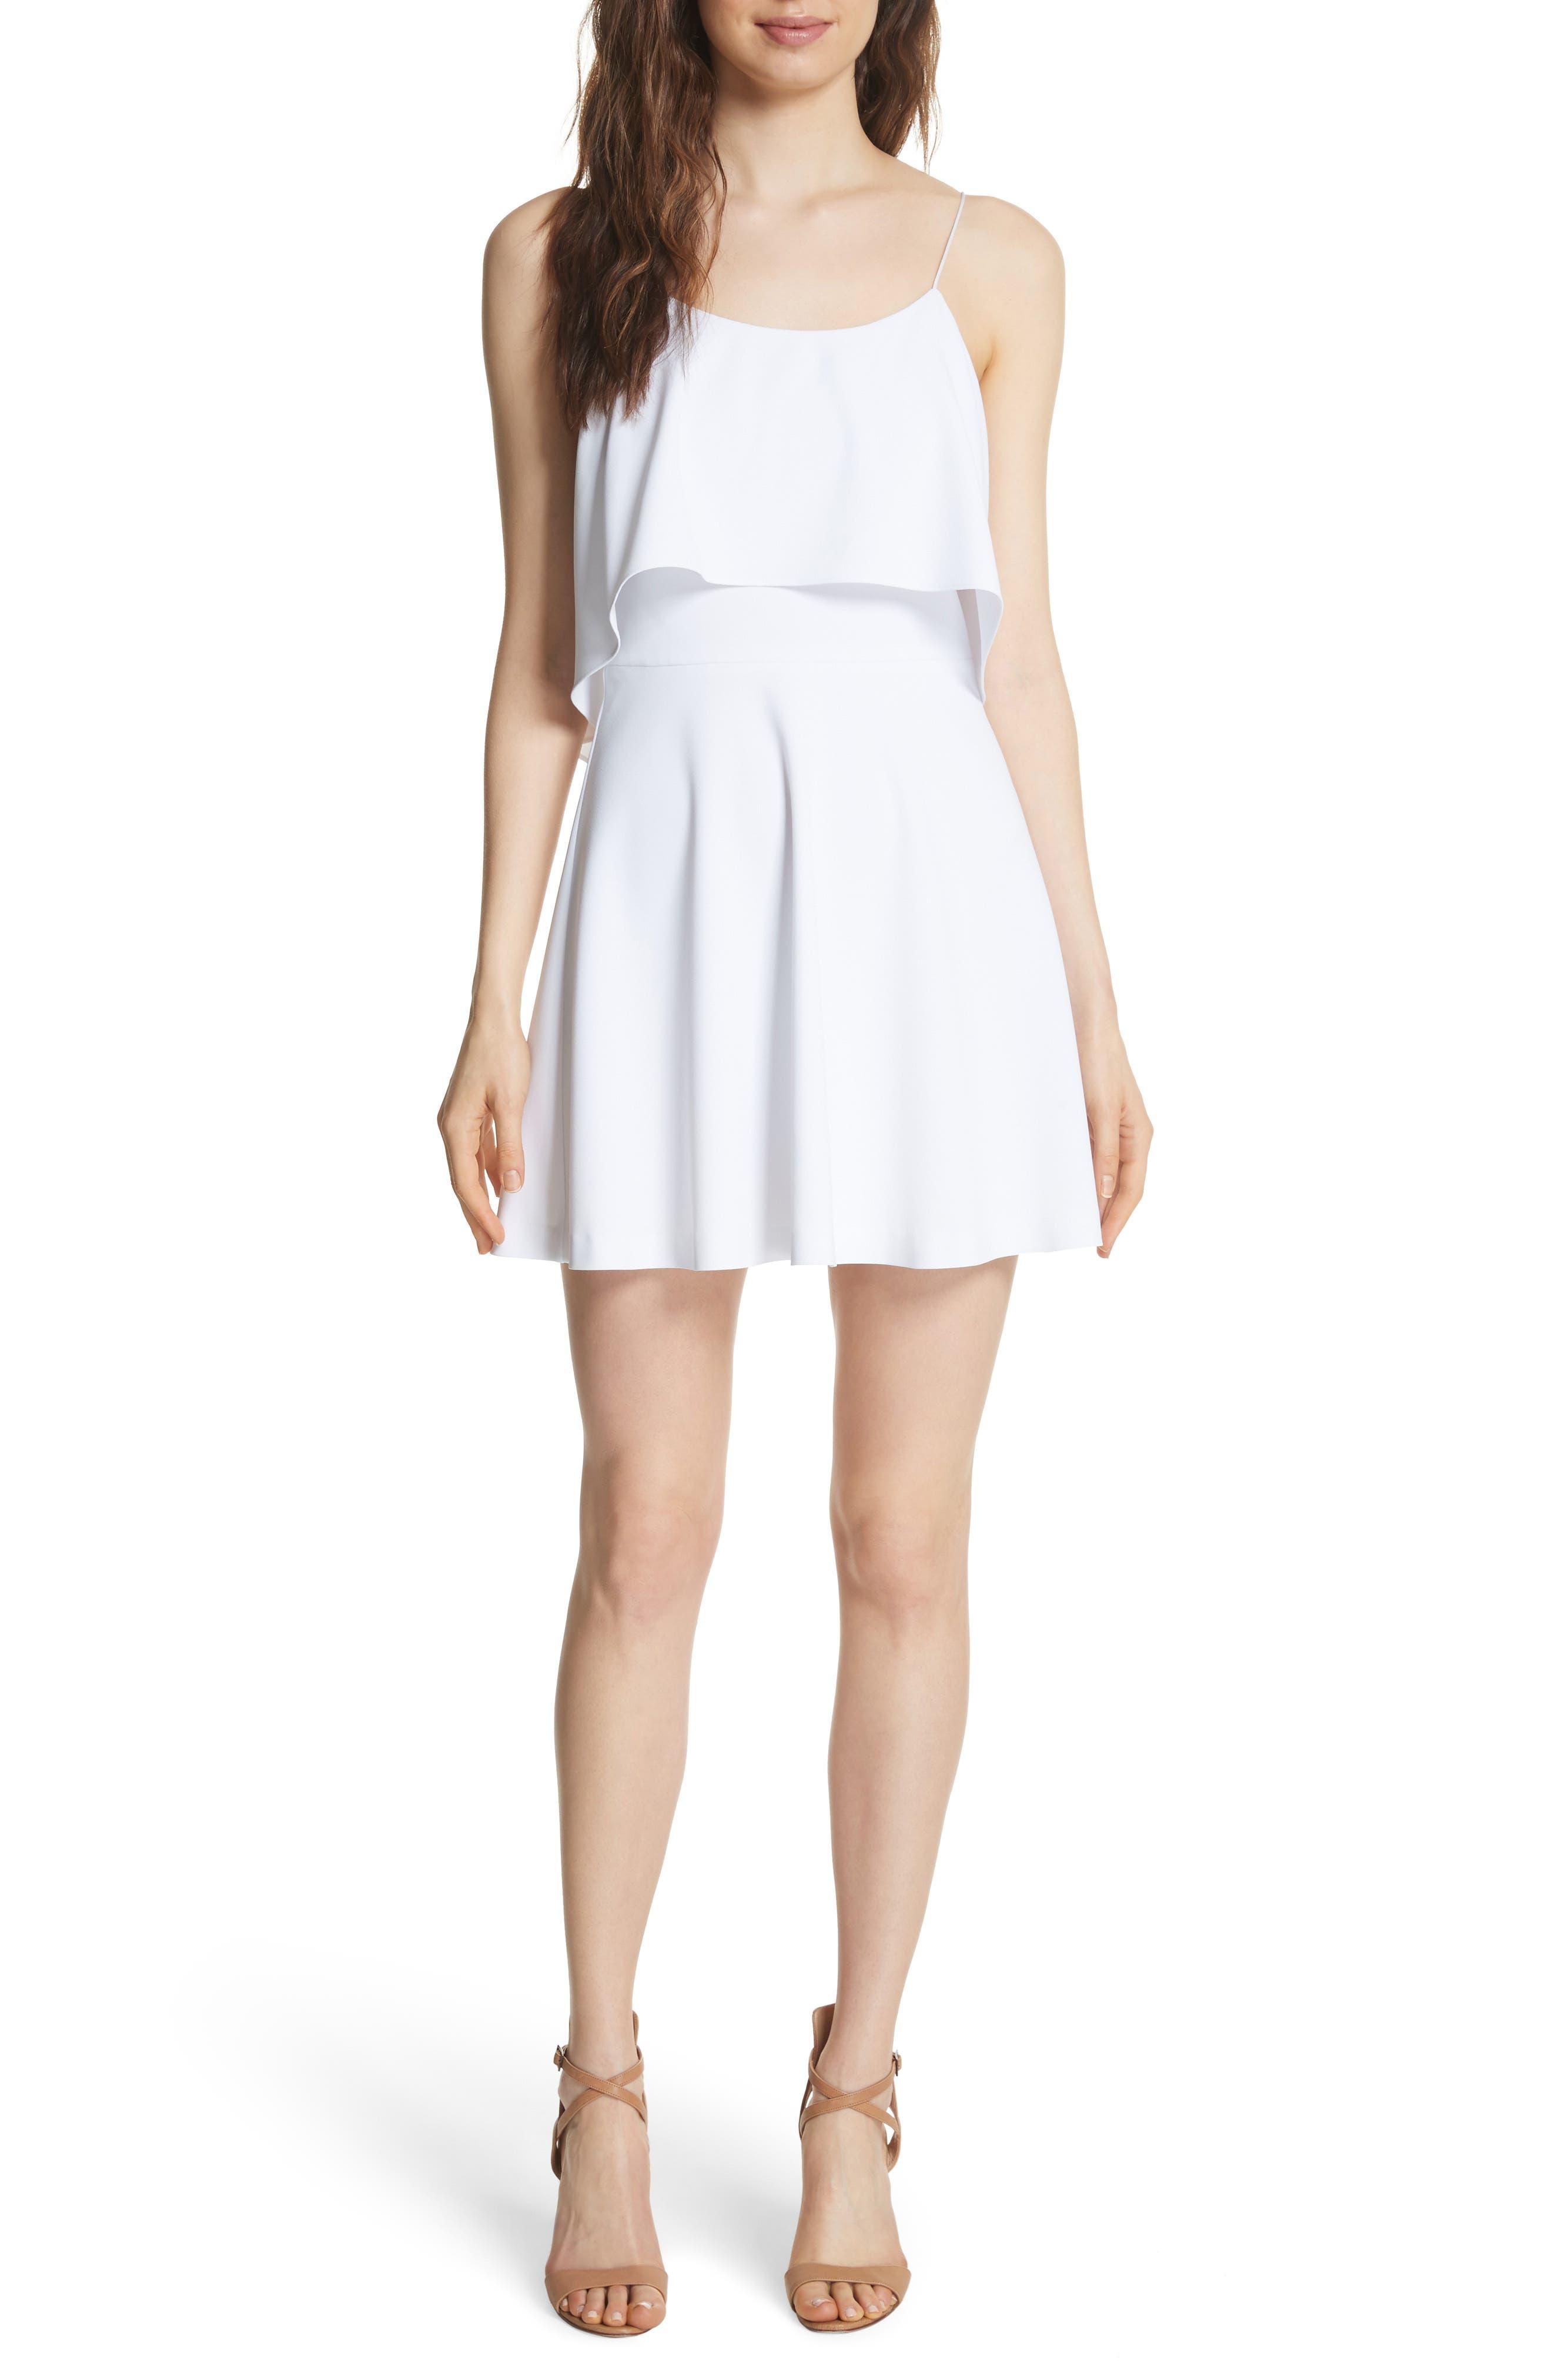 Kipp Layered Ruffle Short Dress,                             Main thumbnail 1, color,                             100